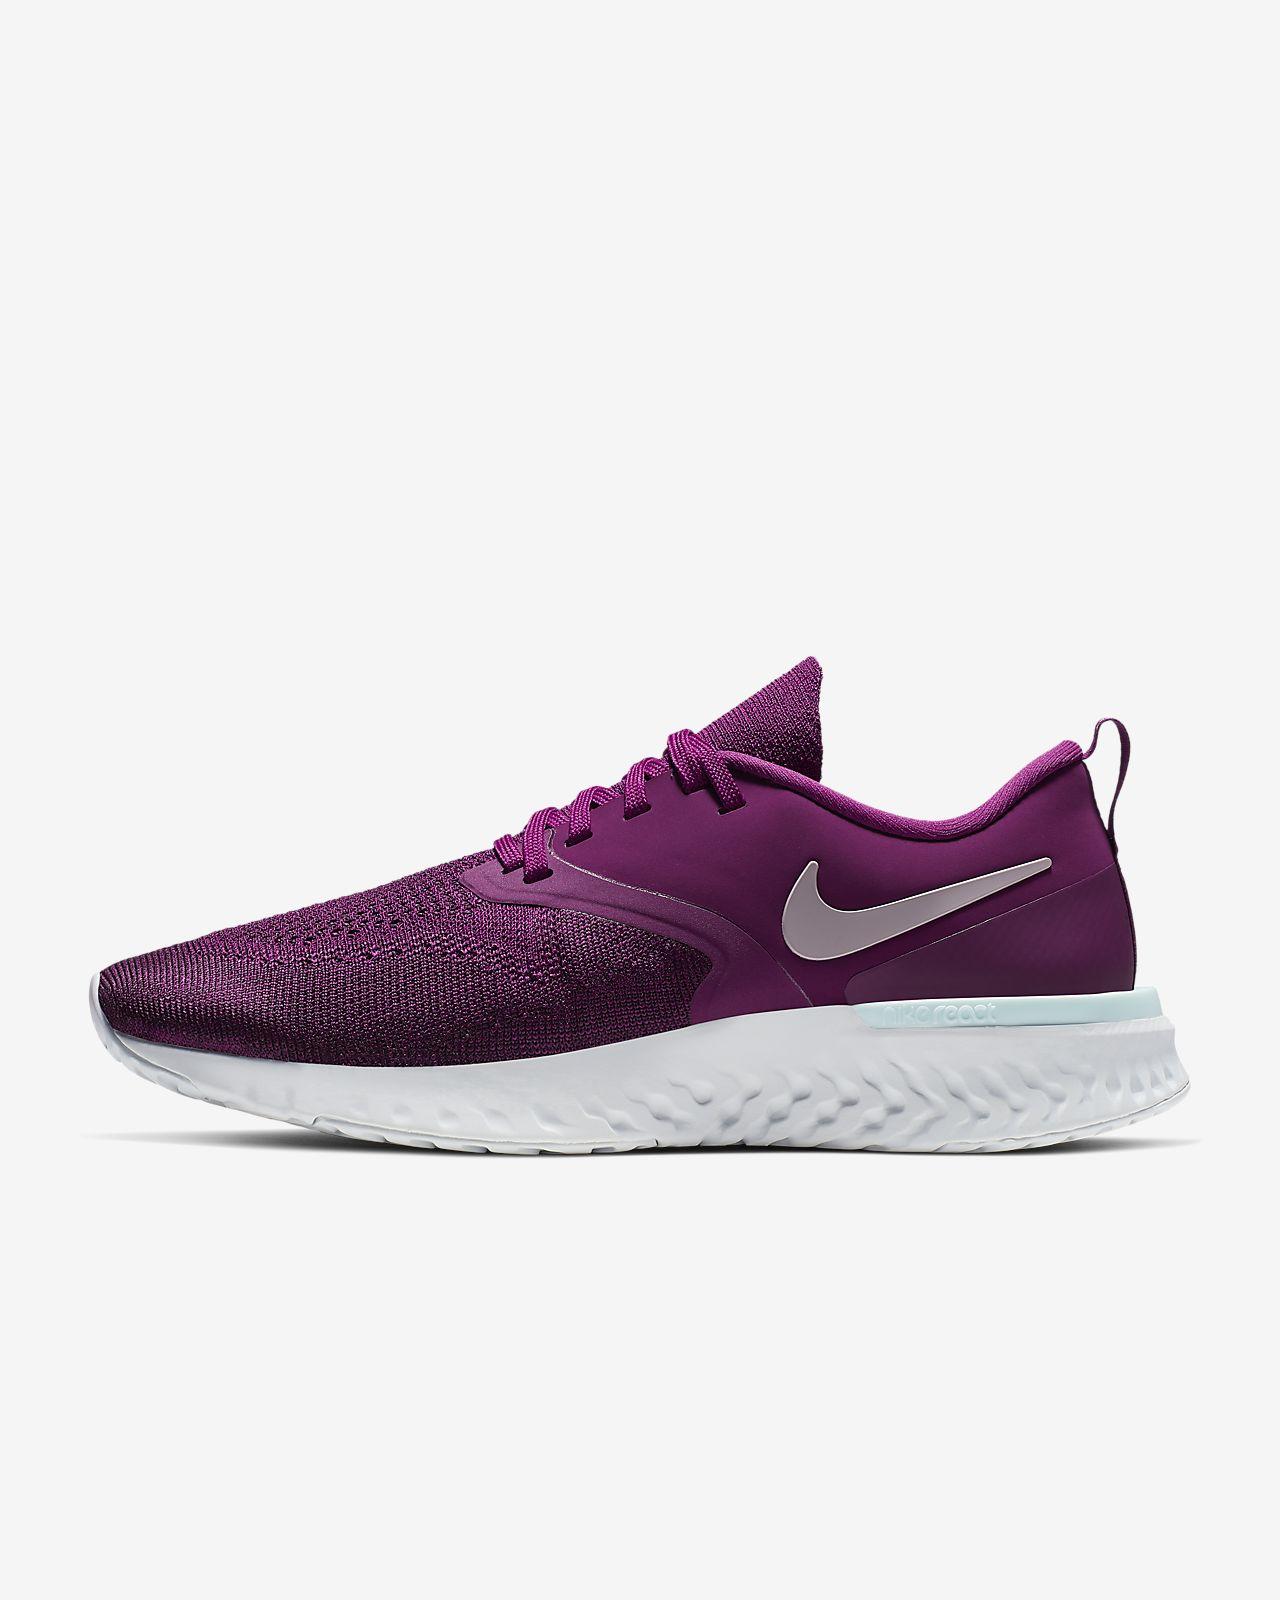 Nike Odyssey React Flyknit 2 Women s Running Shoe. Nike.com 1e714ddef59